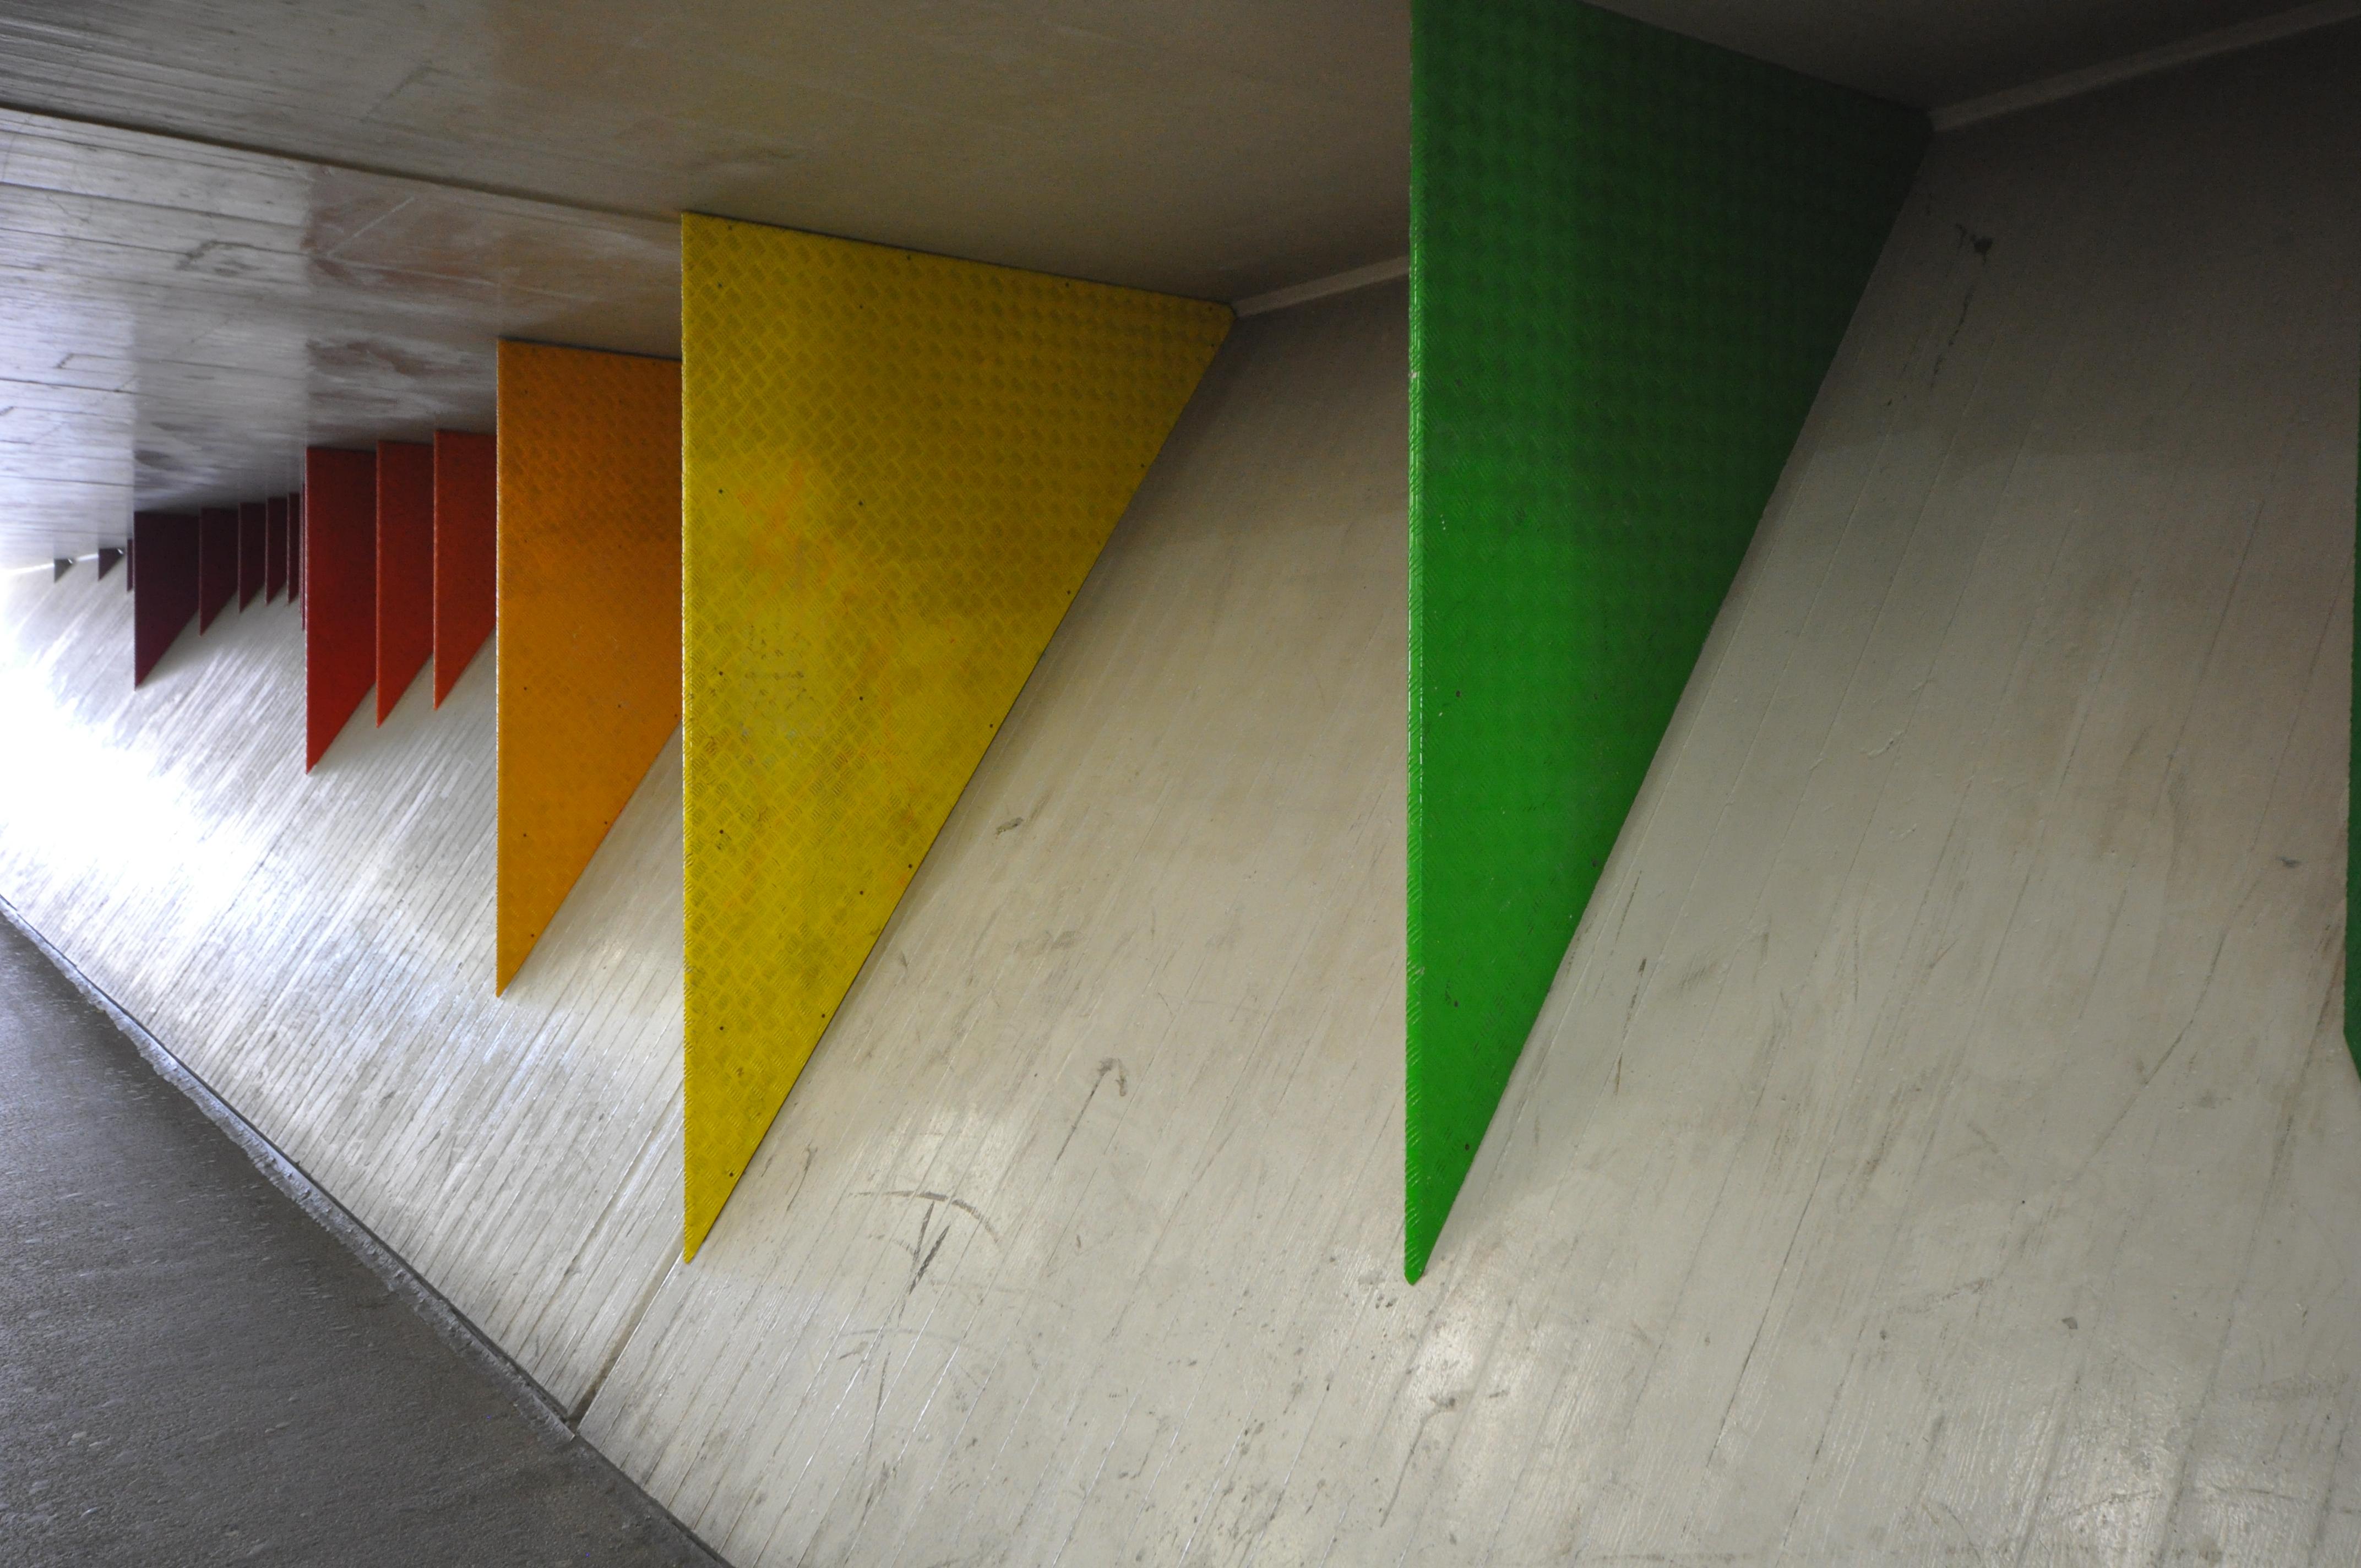 File:Wandgestaltung Langstrassenunterführung, 1986, Jürg Grau   2014 09 23